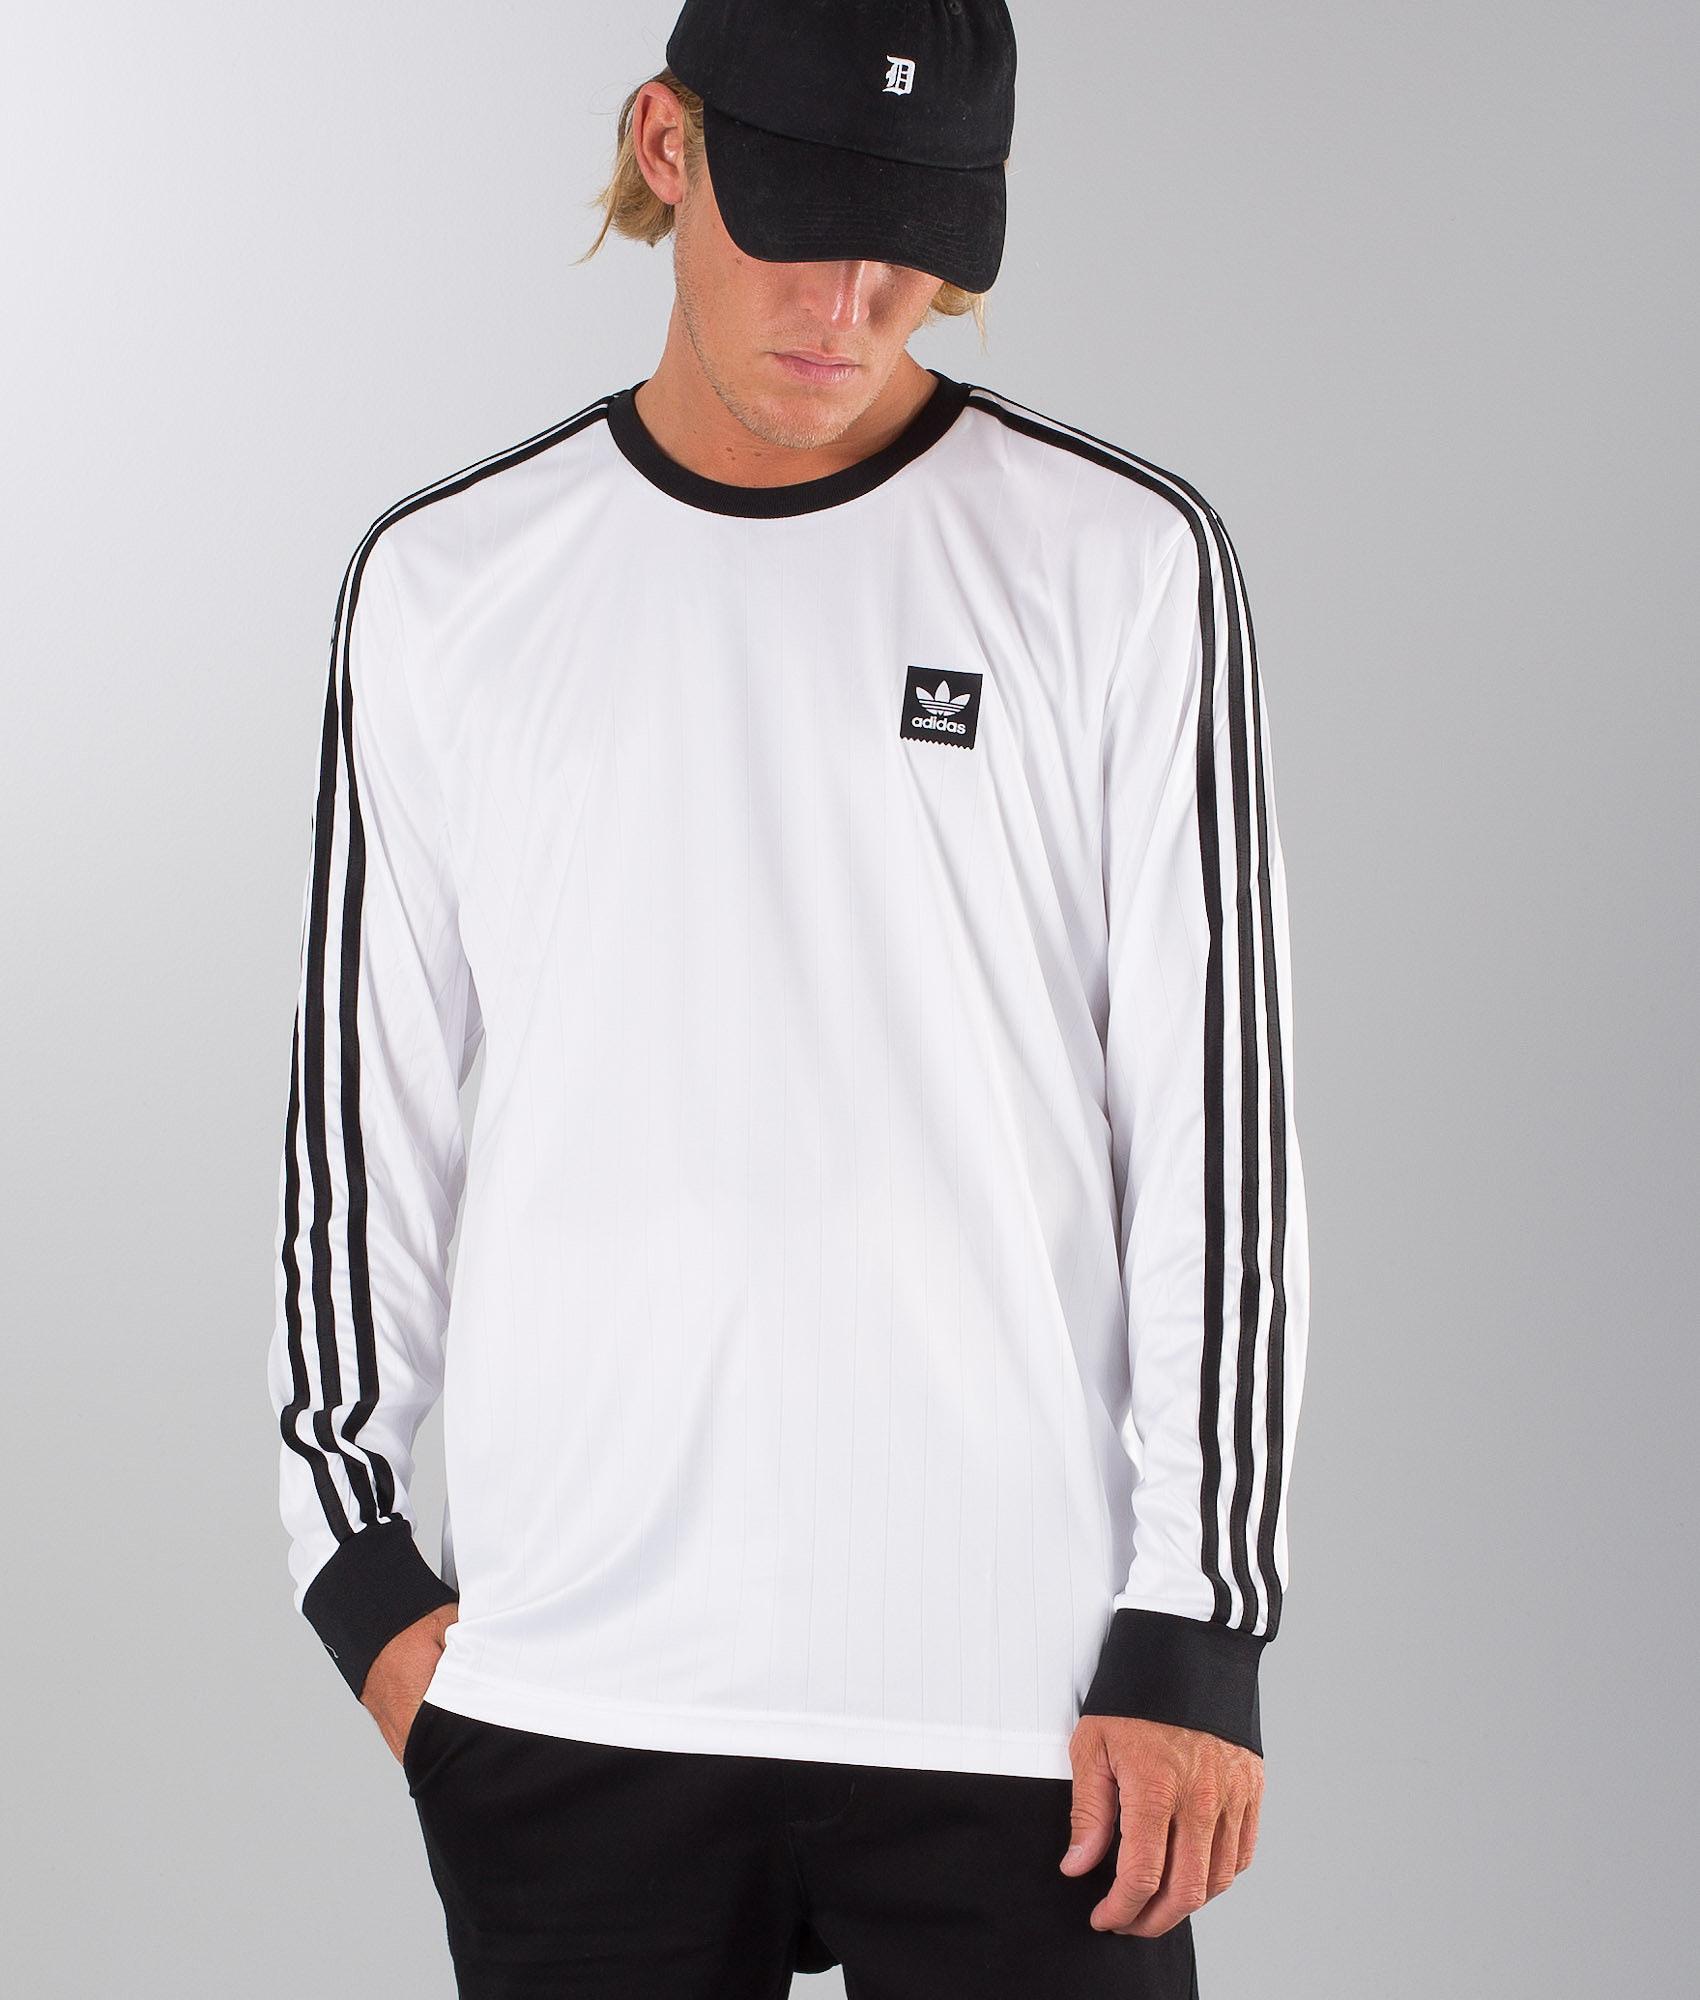 80ce63dd Adidas Skateboarding Ls Club Jersey Longsleeve White. White/Black